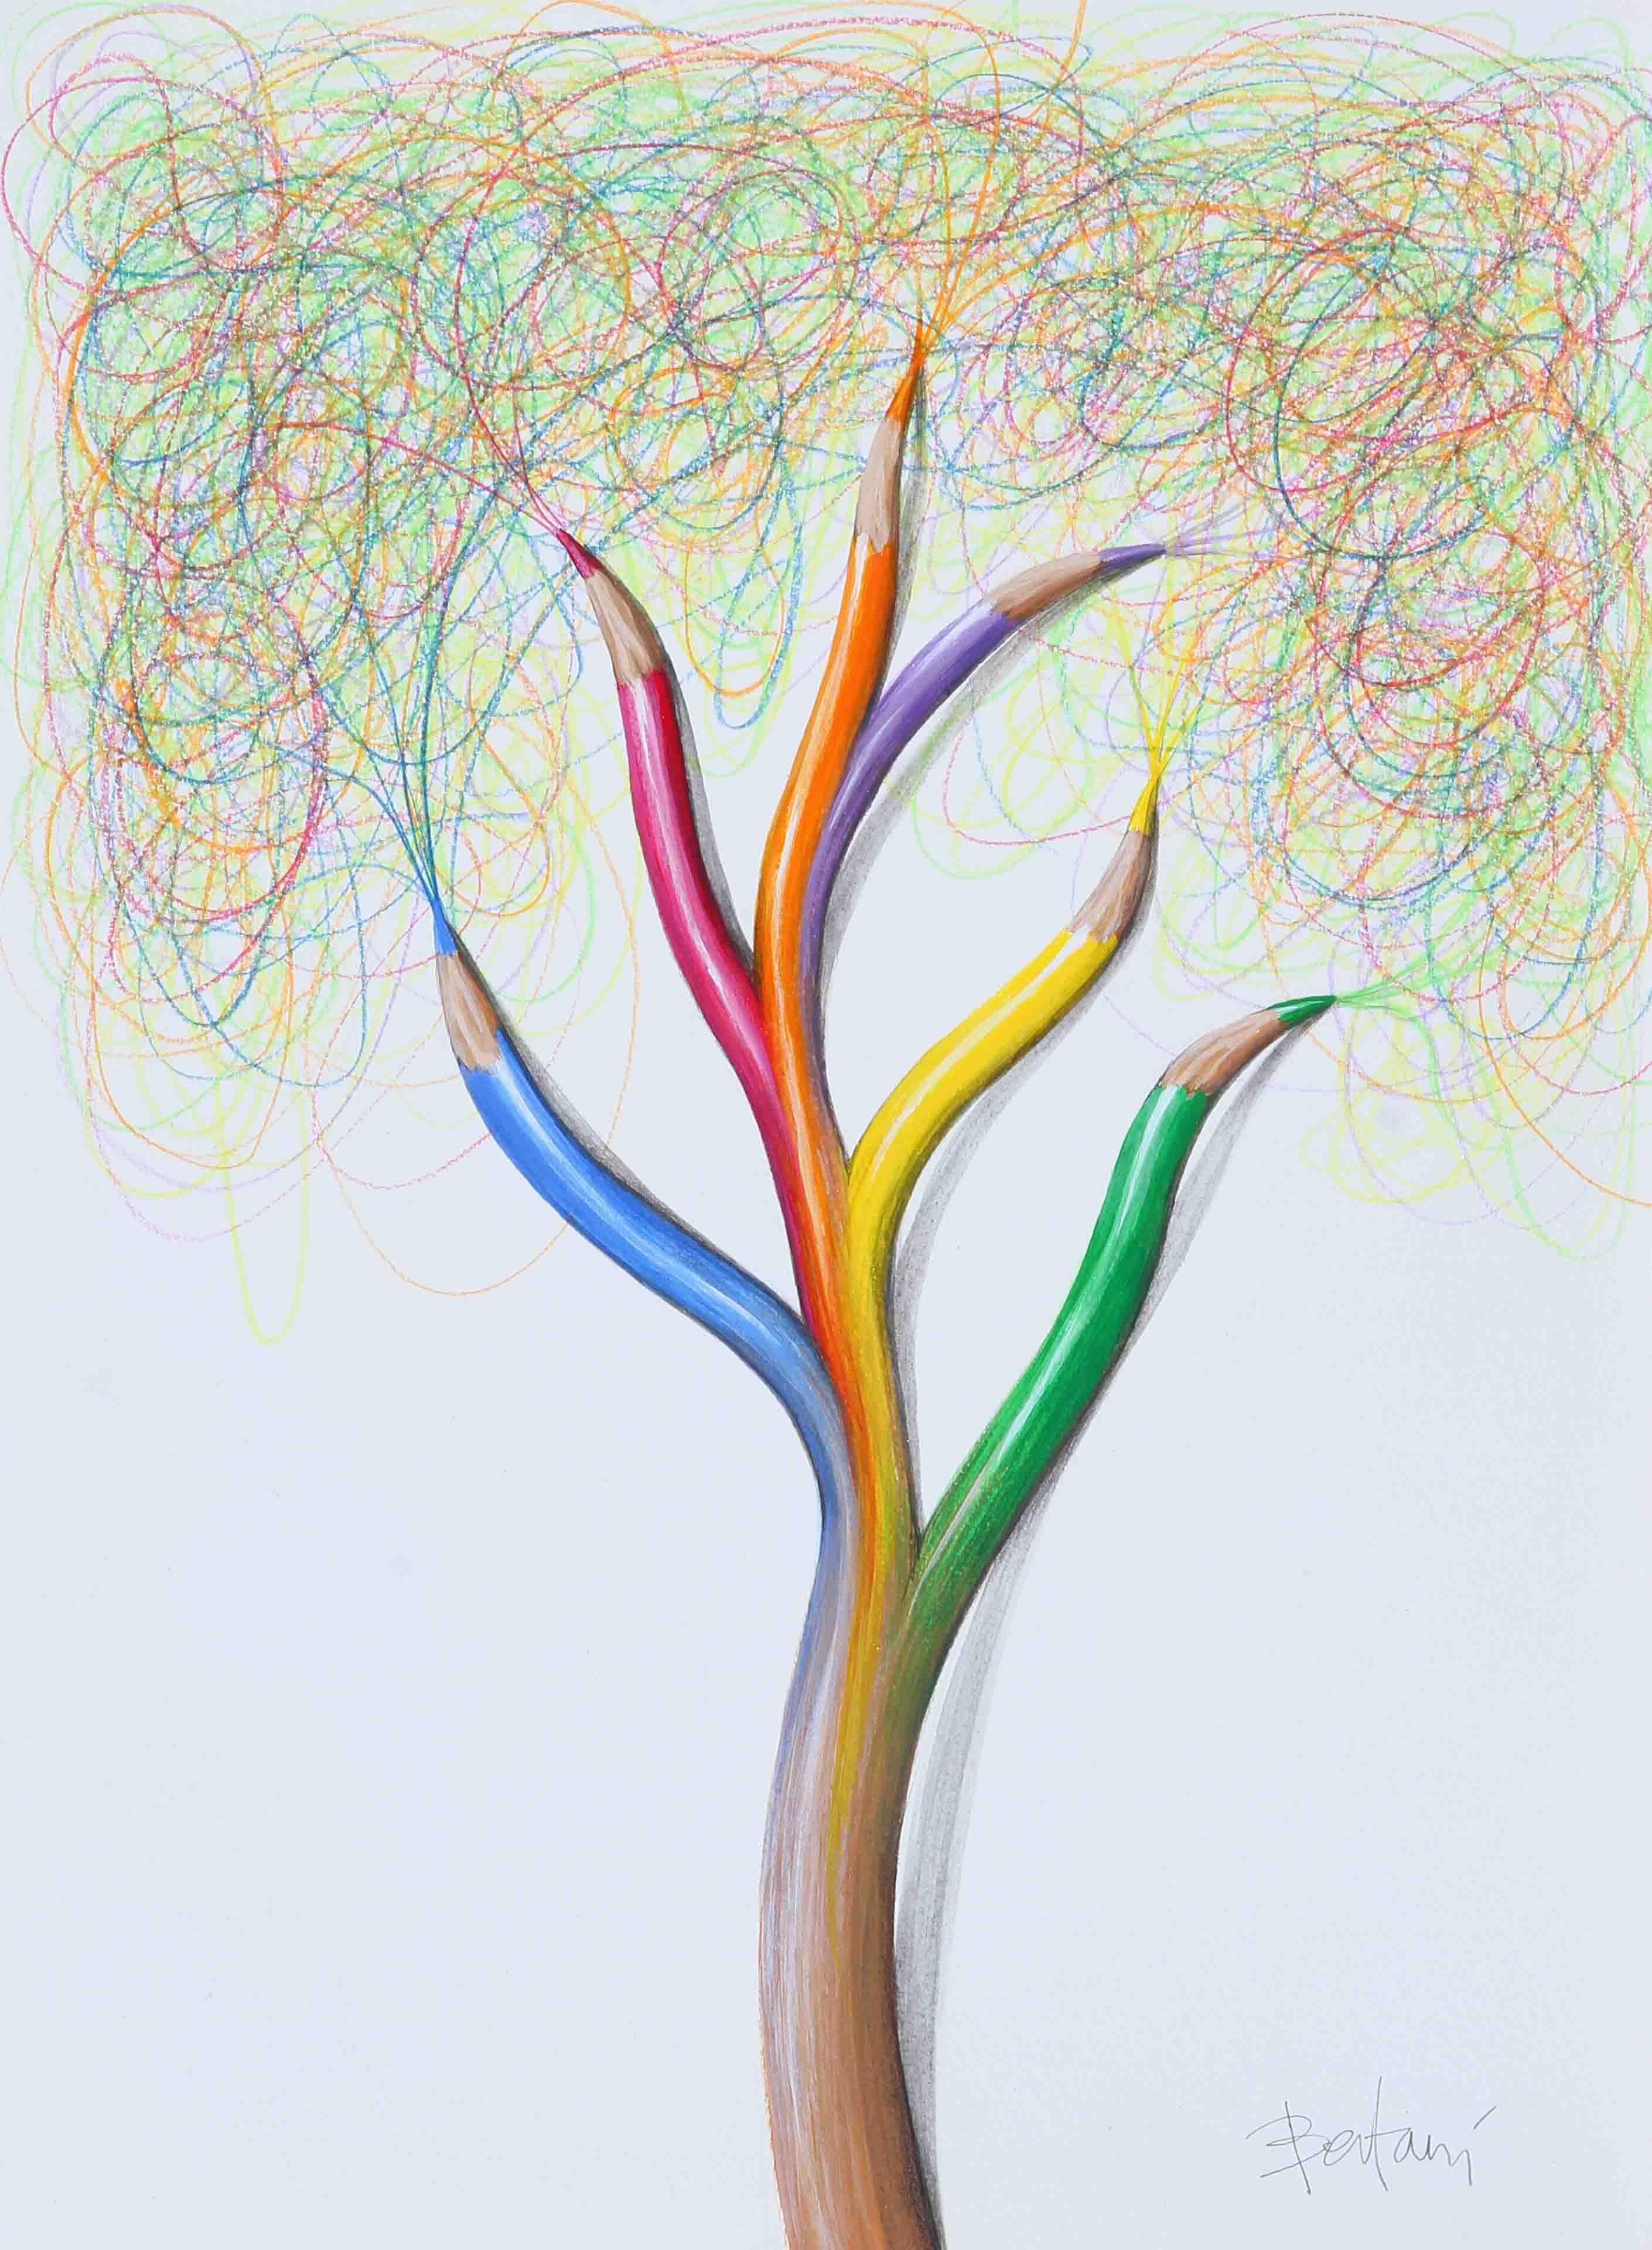 93 ideas de Ernesto Bertani | lienzos, escultura de león, cien pesos